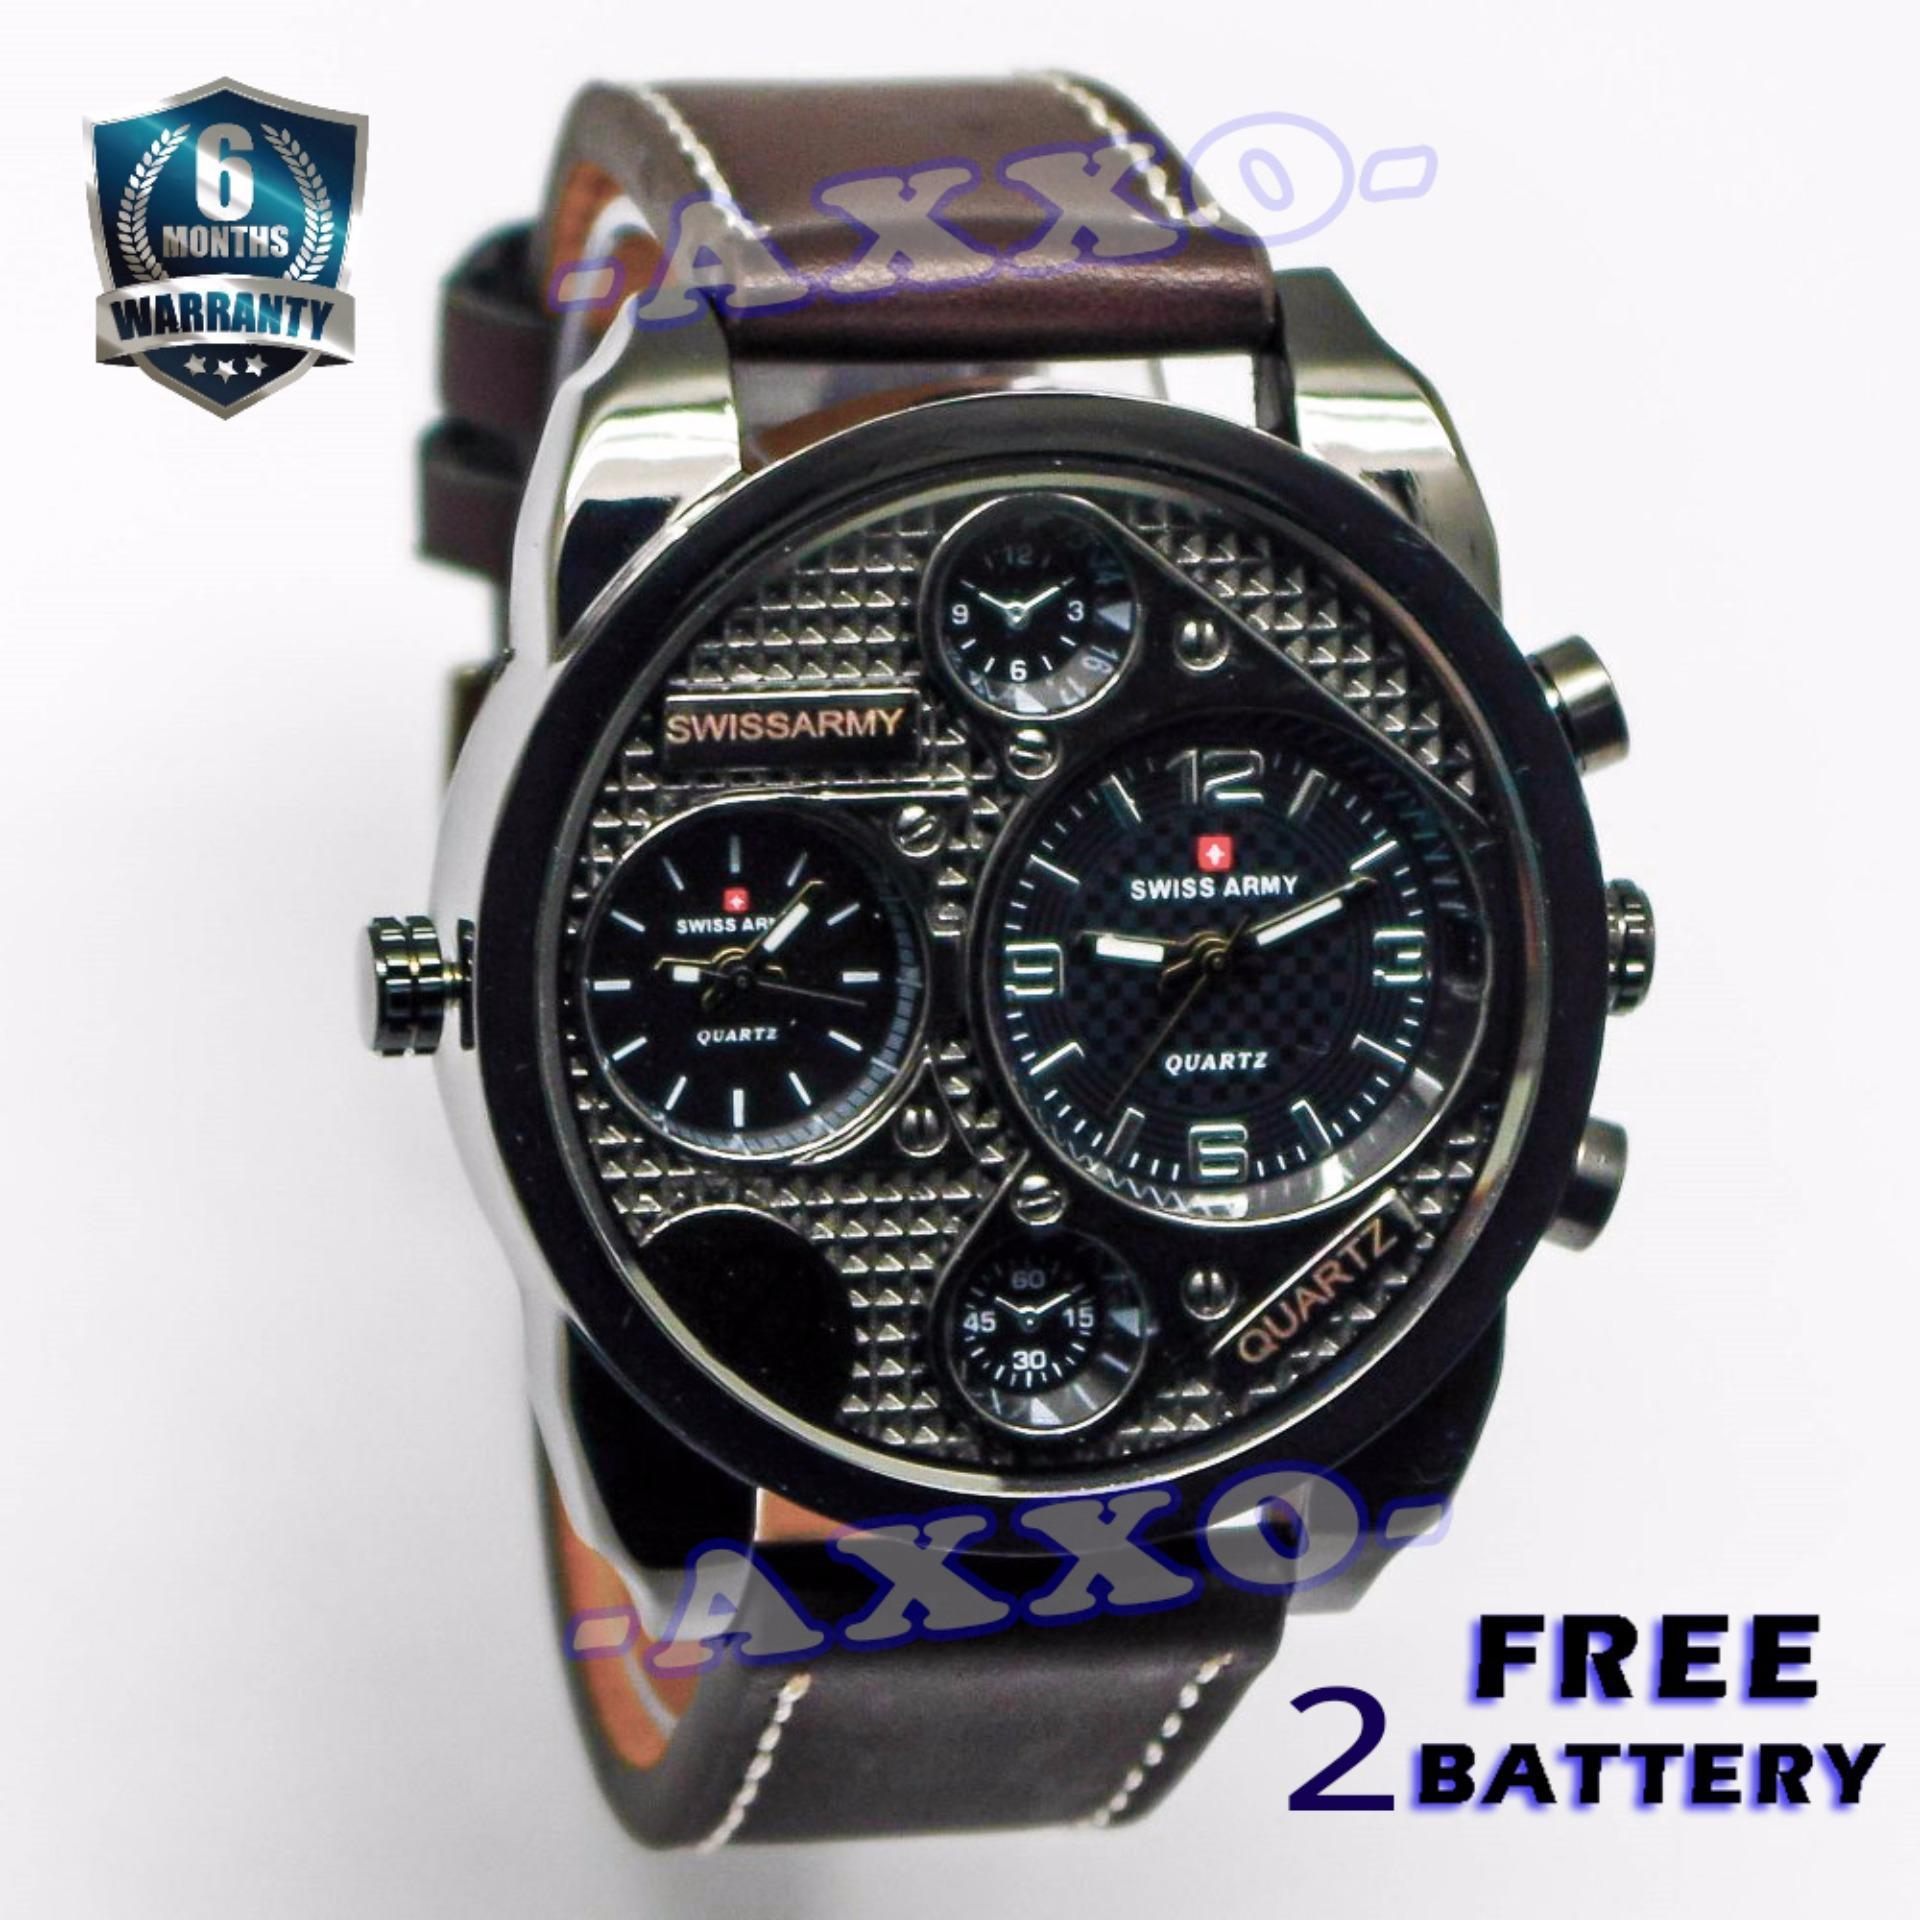 Swiss Army Dual Time - Jam Tangan Pria - Coklat Tua - Strap Kulit - SA 9100-1 L ...